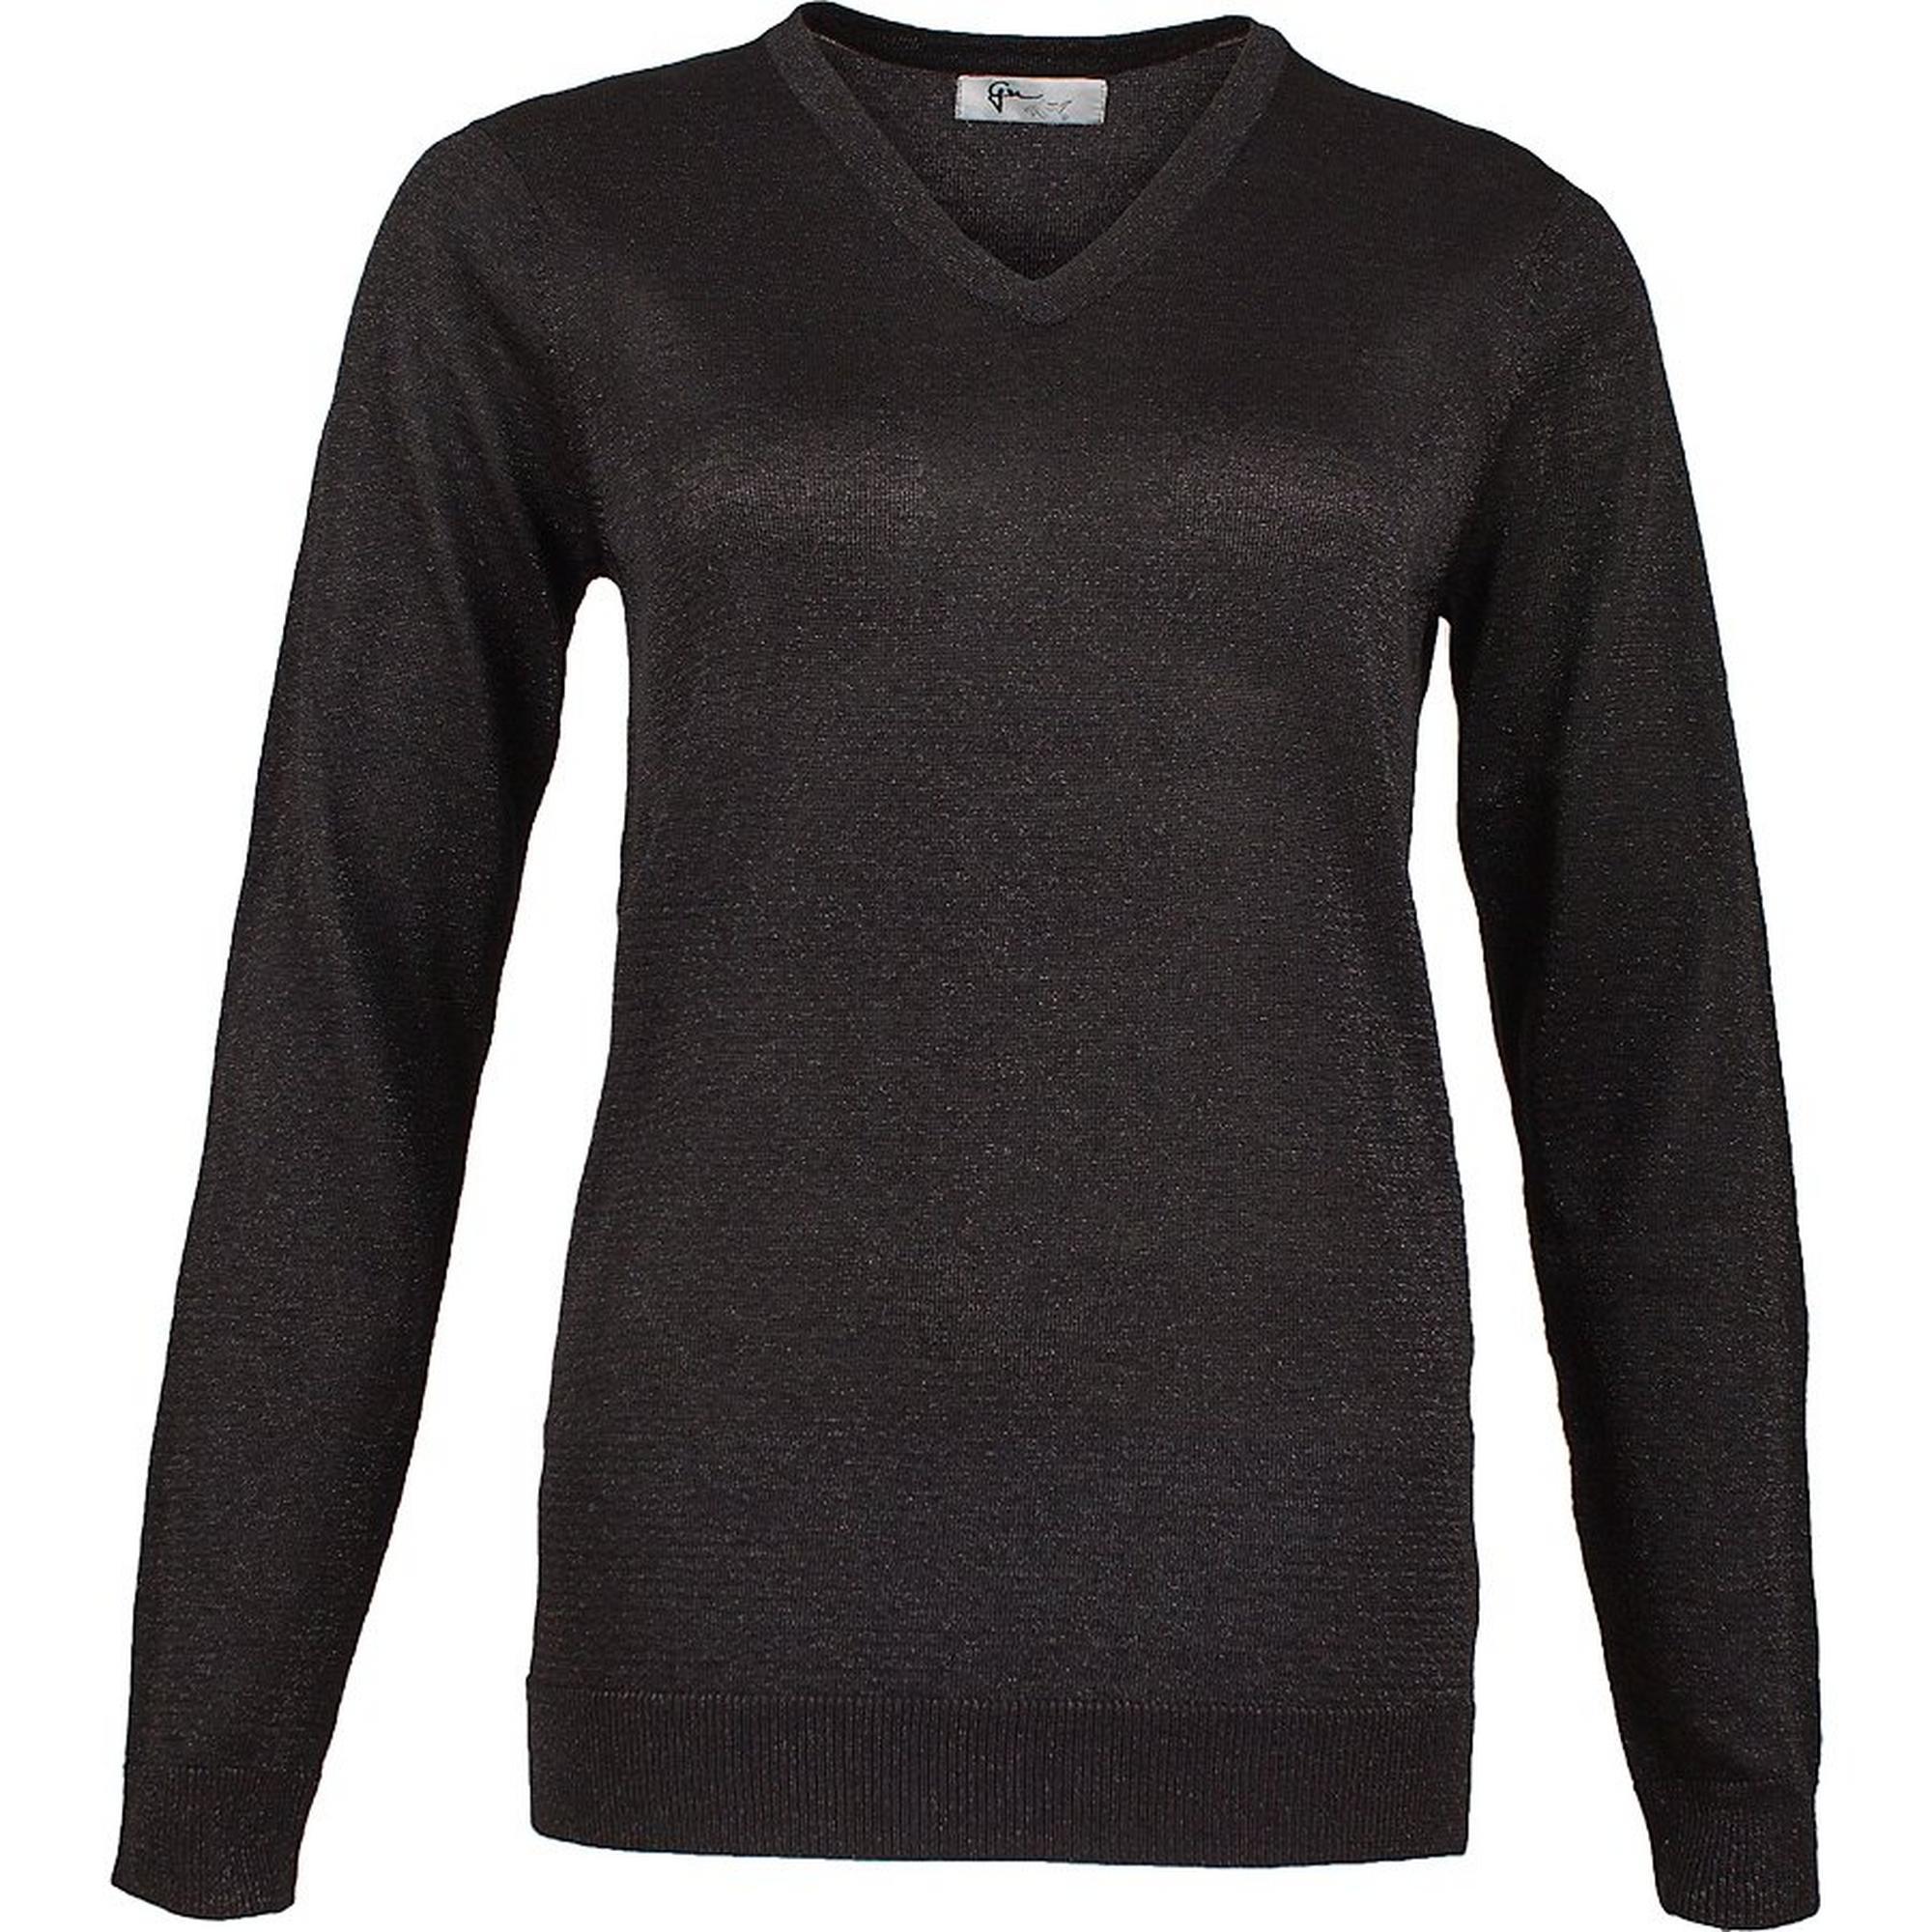 Women's Lurex V-Neck Long Sleeve Sweater